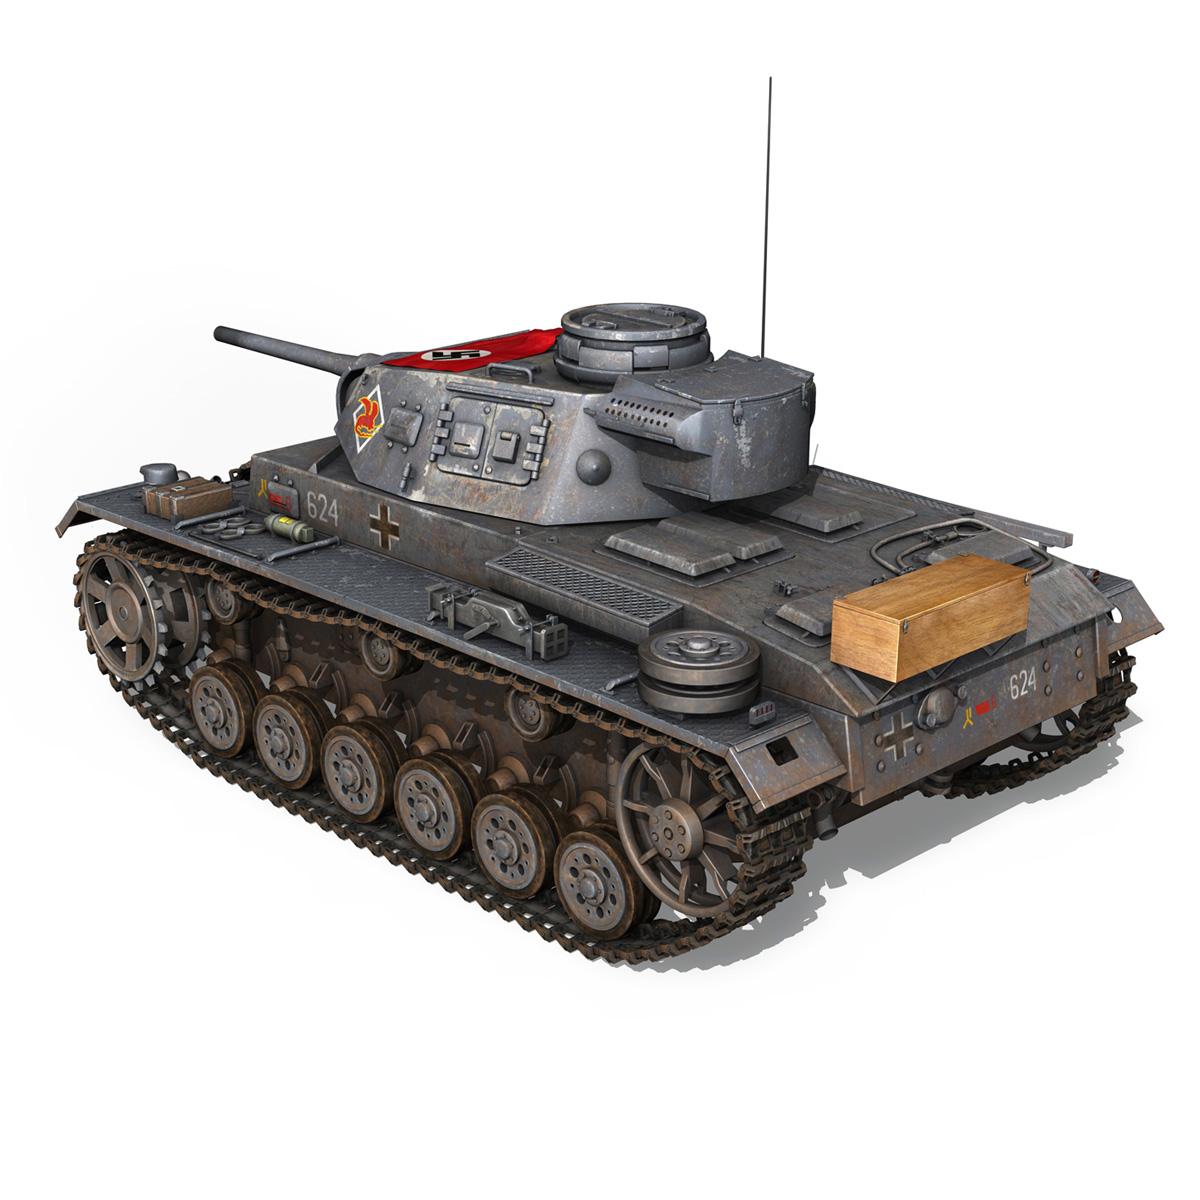 pzkpfw iii – panzer 3 – ausf.j – 624 3d model 3ds fbx lwo lw lws obj c4d 265301